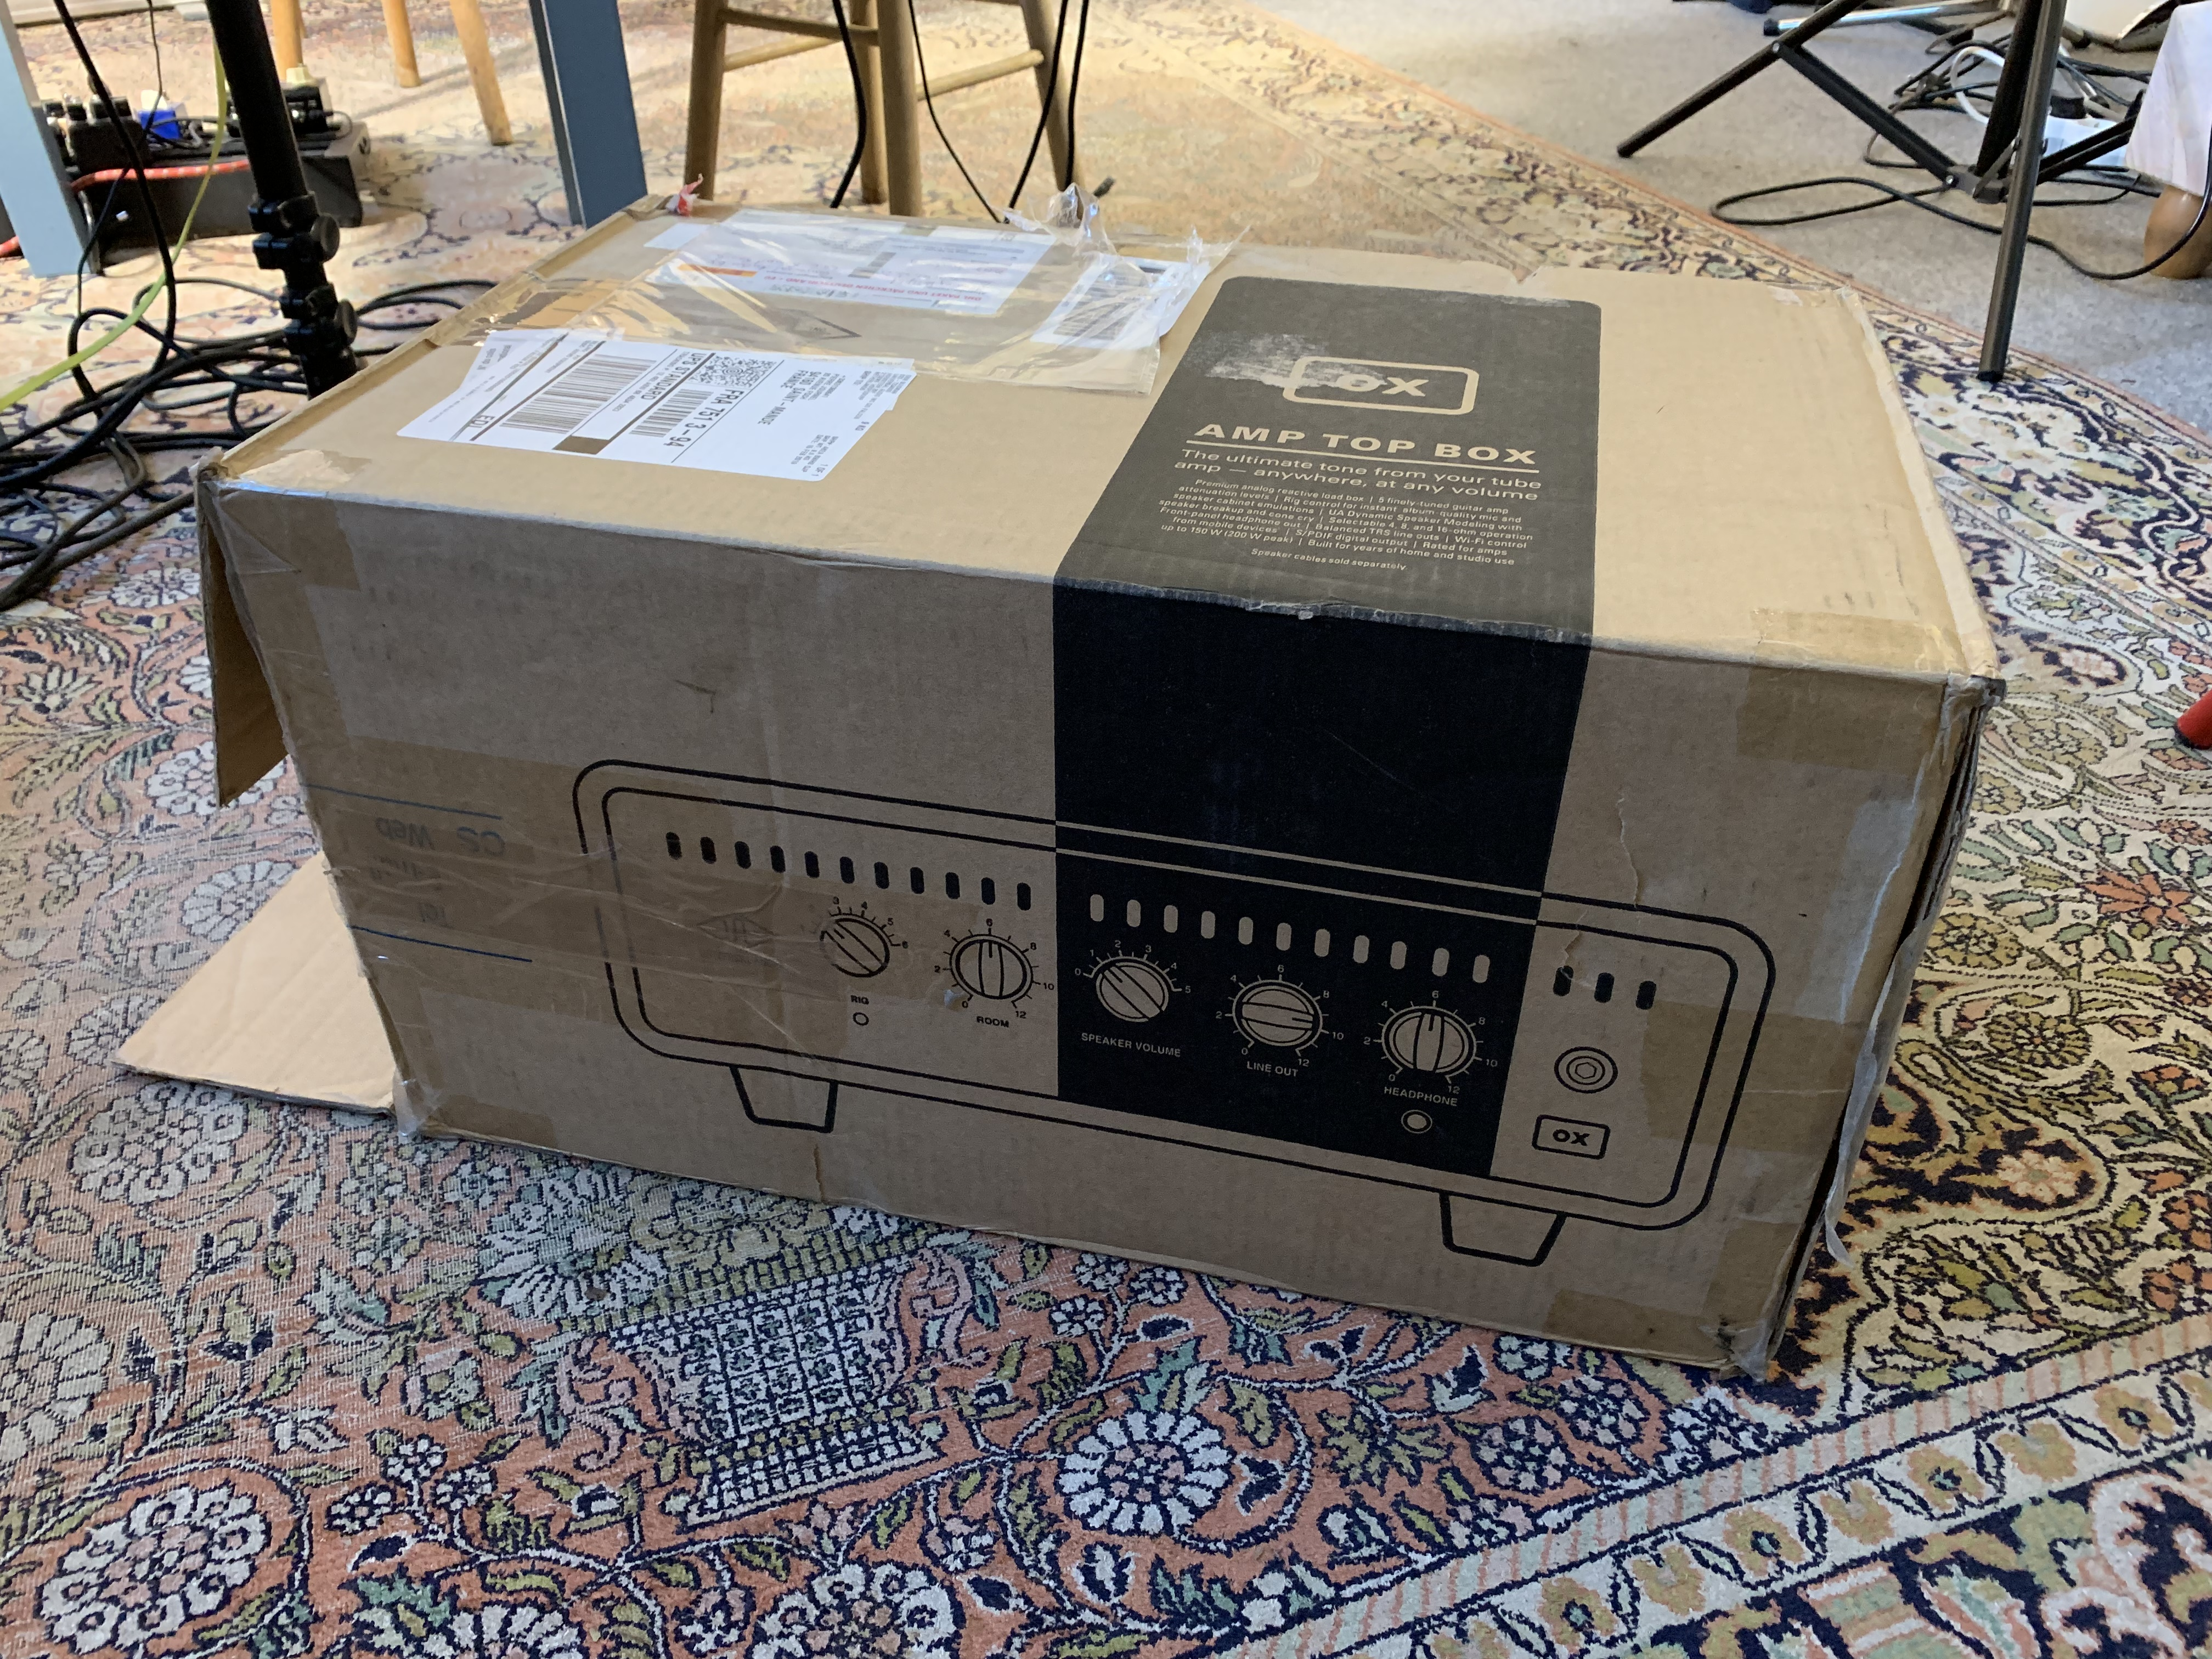 Unboxing loadbox réactive OX Amp Top Box Universal Audio